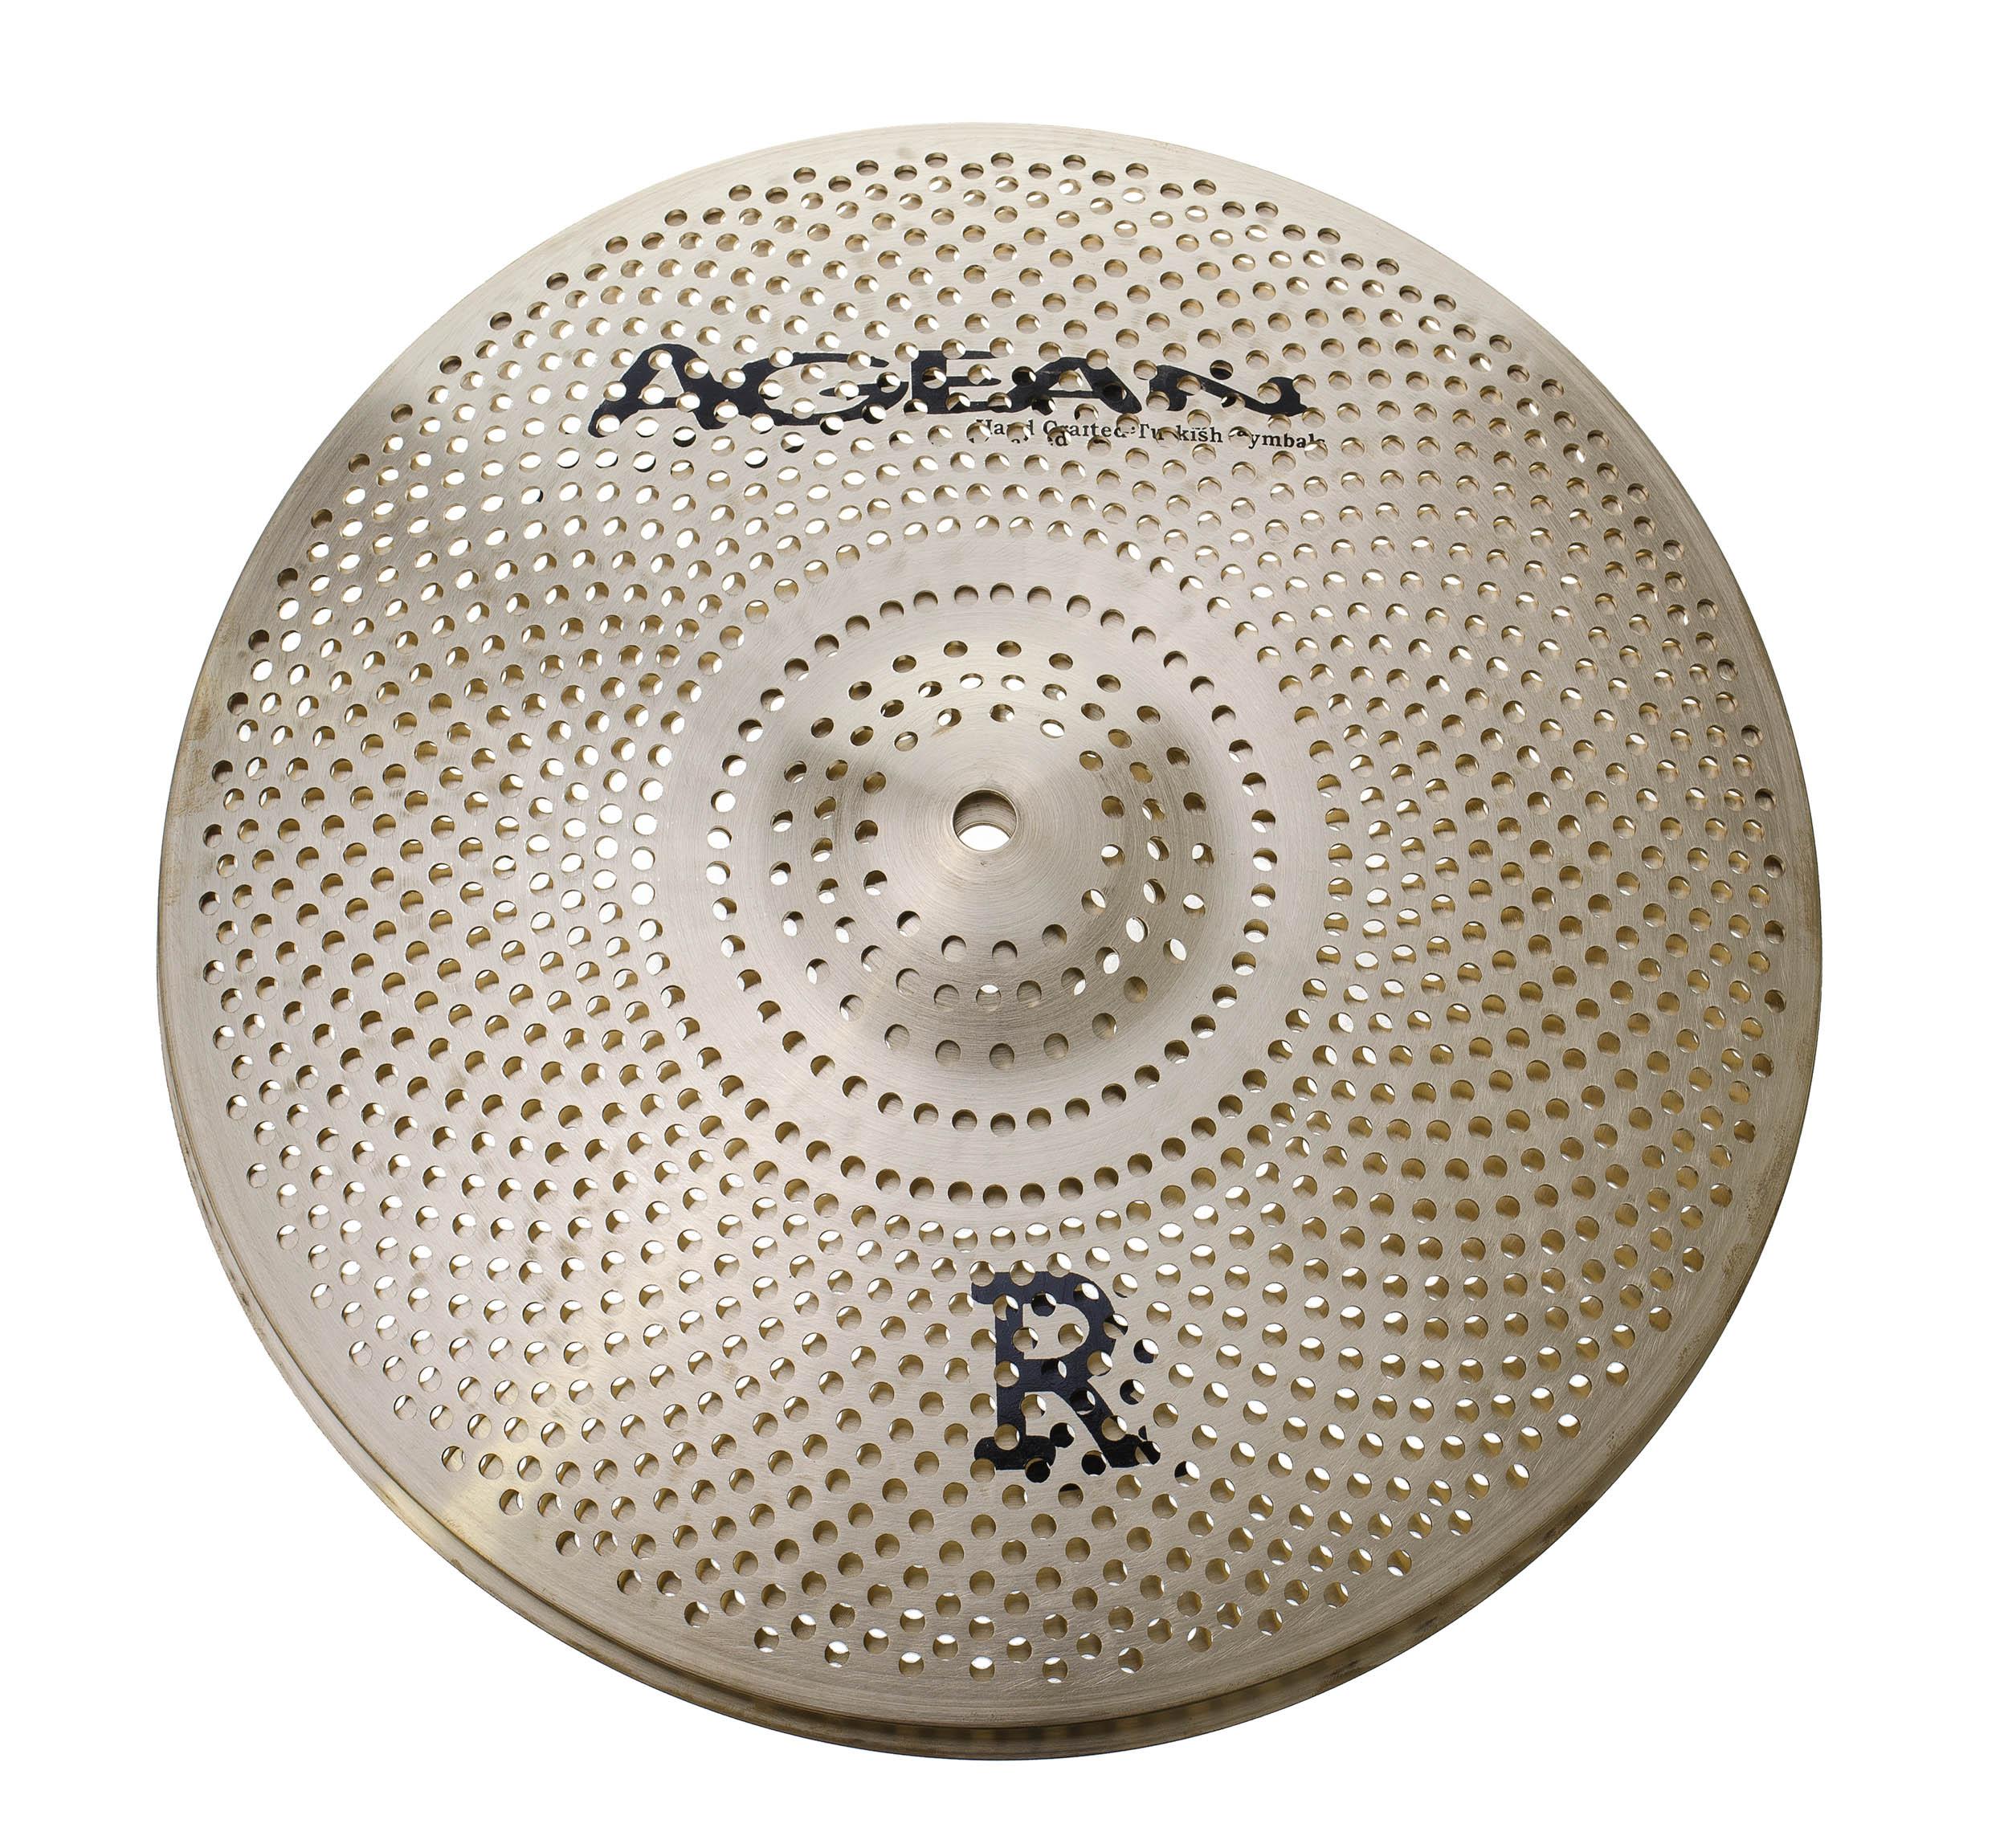 agean r low noise 14 hi hat real feel practice hi hat cymbal drum tec. Black Bedroom Furniture Sets. Home Design Ideas